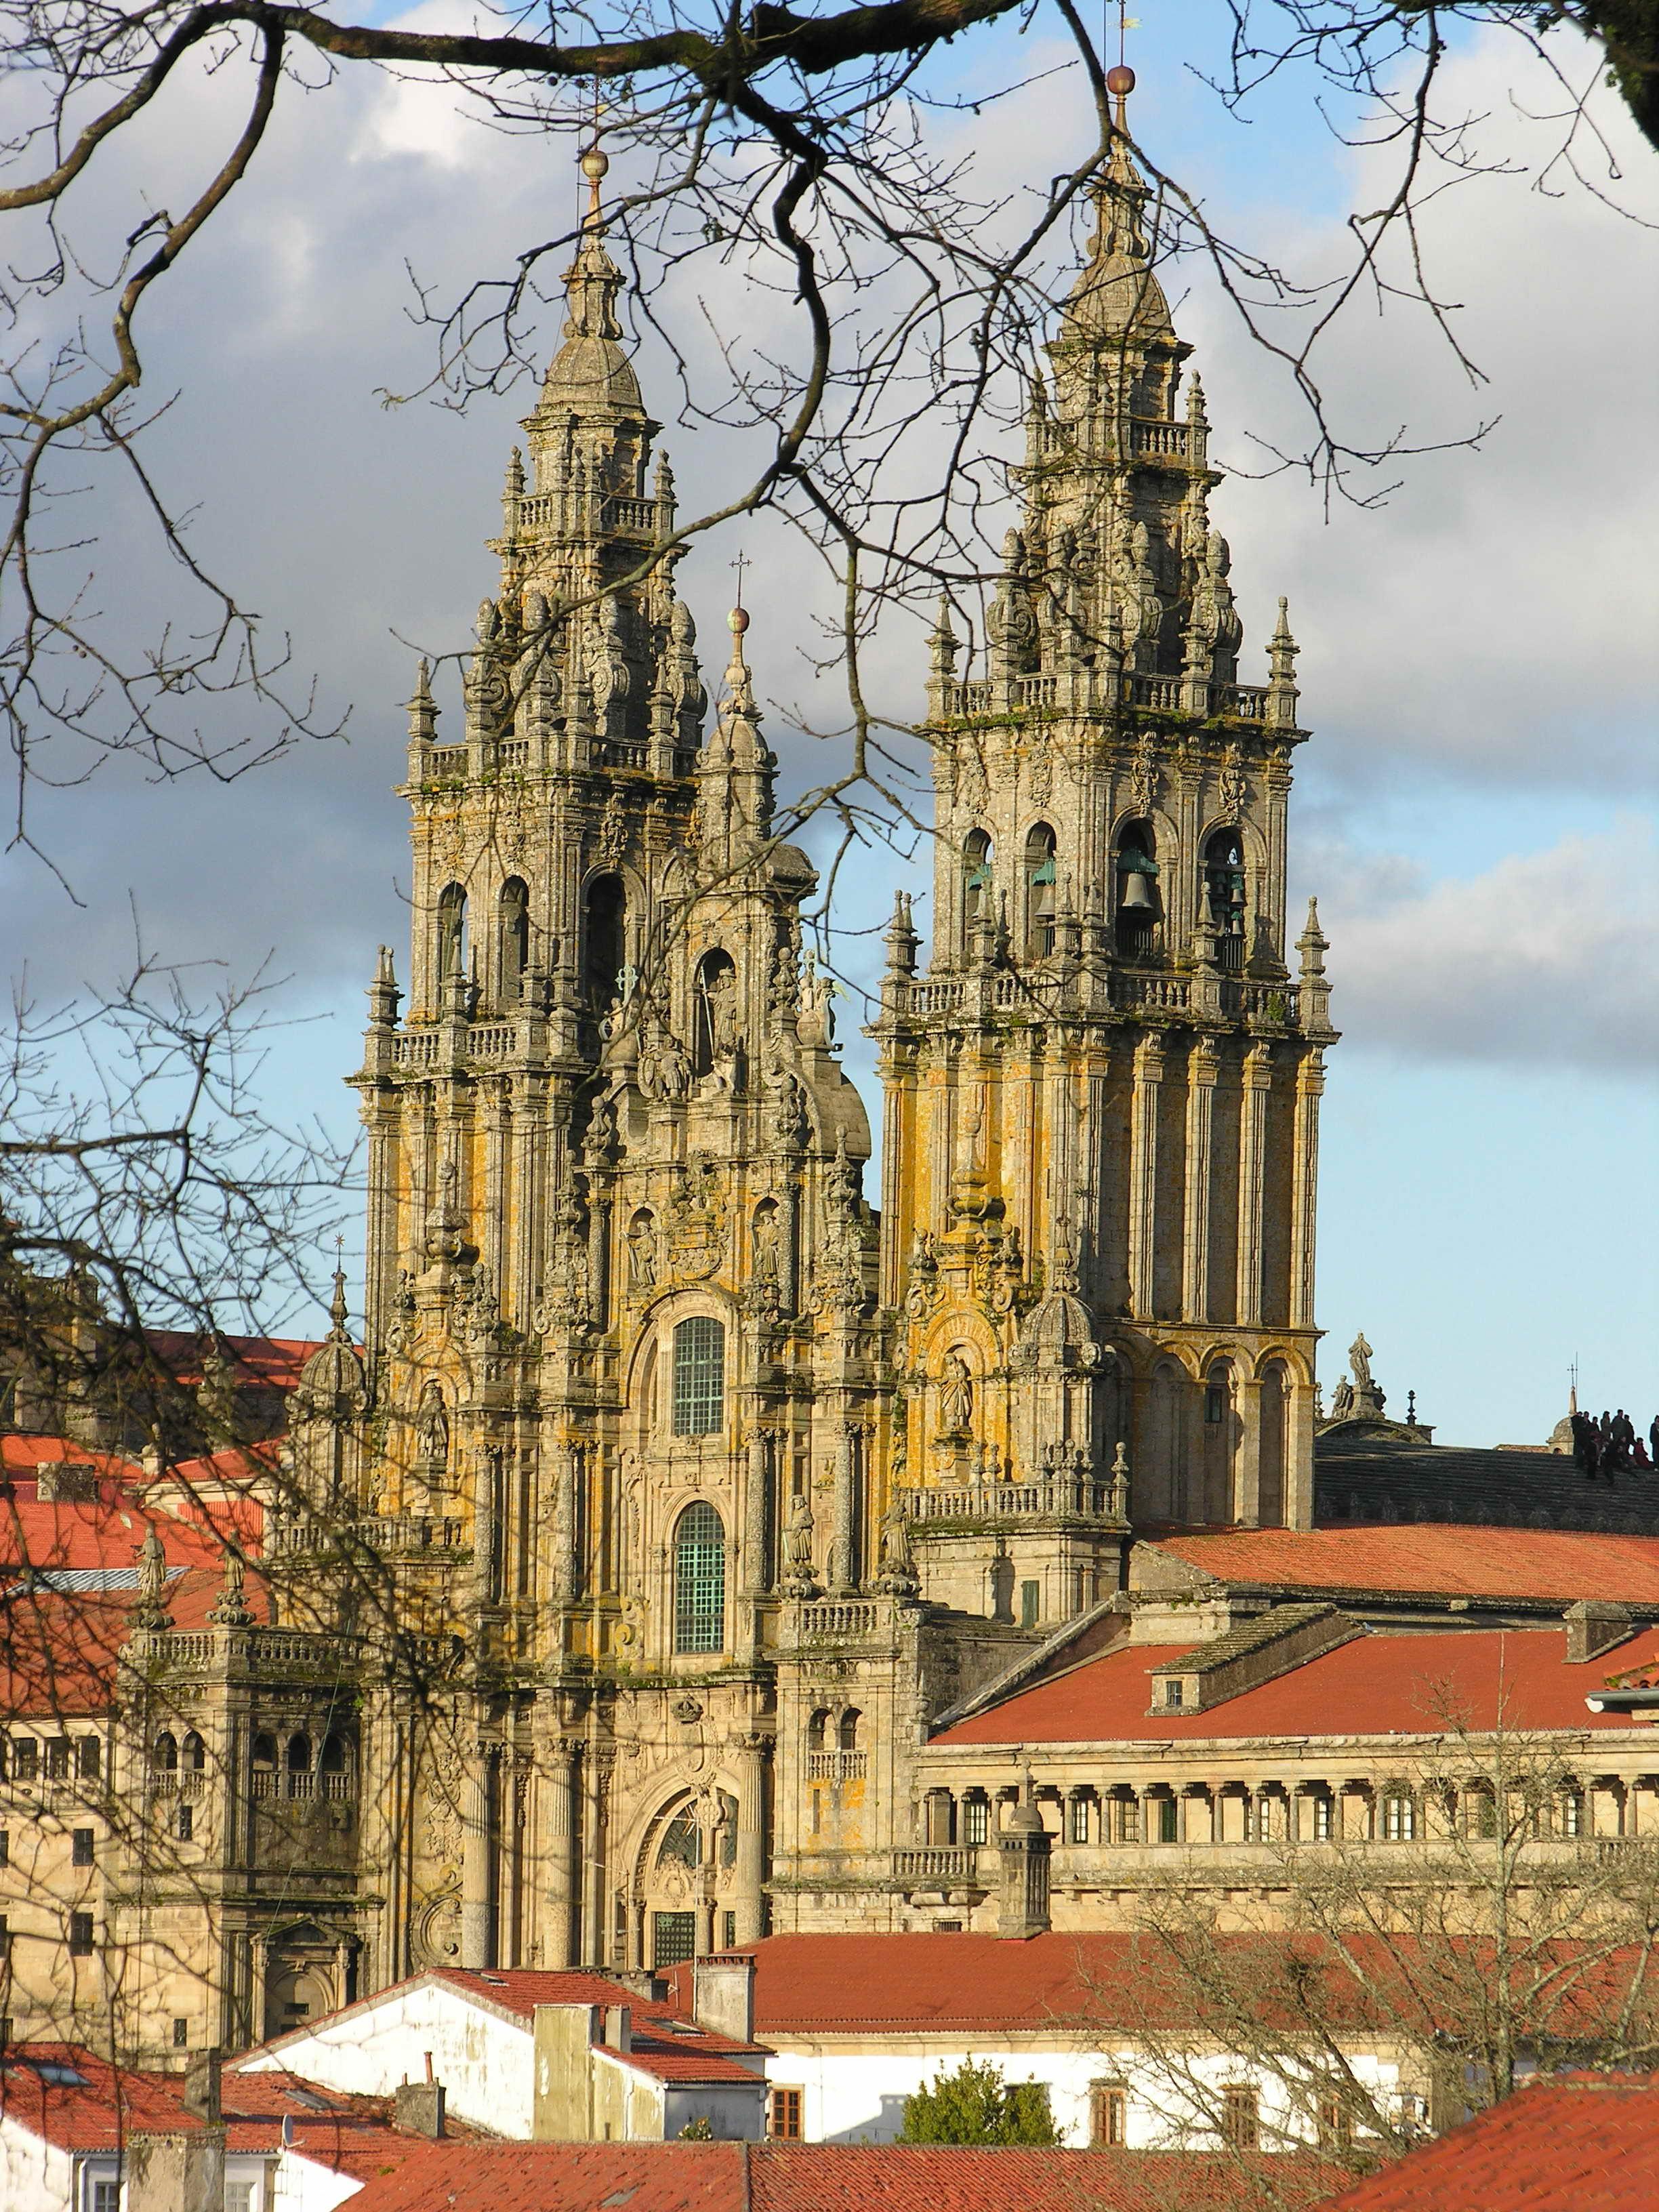 Fotografia colorida da fachada principal da catedral de Santiago de Compostela.